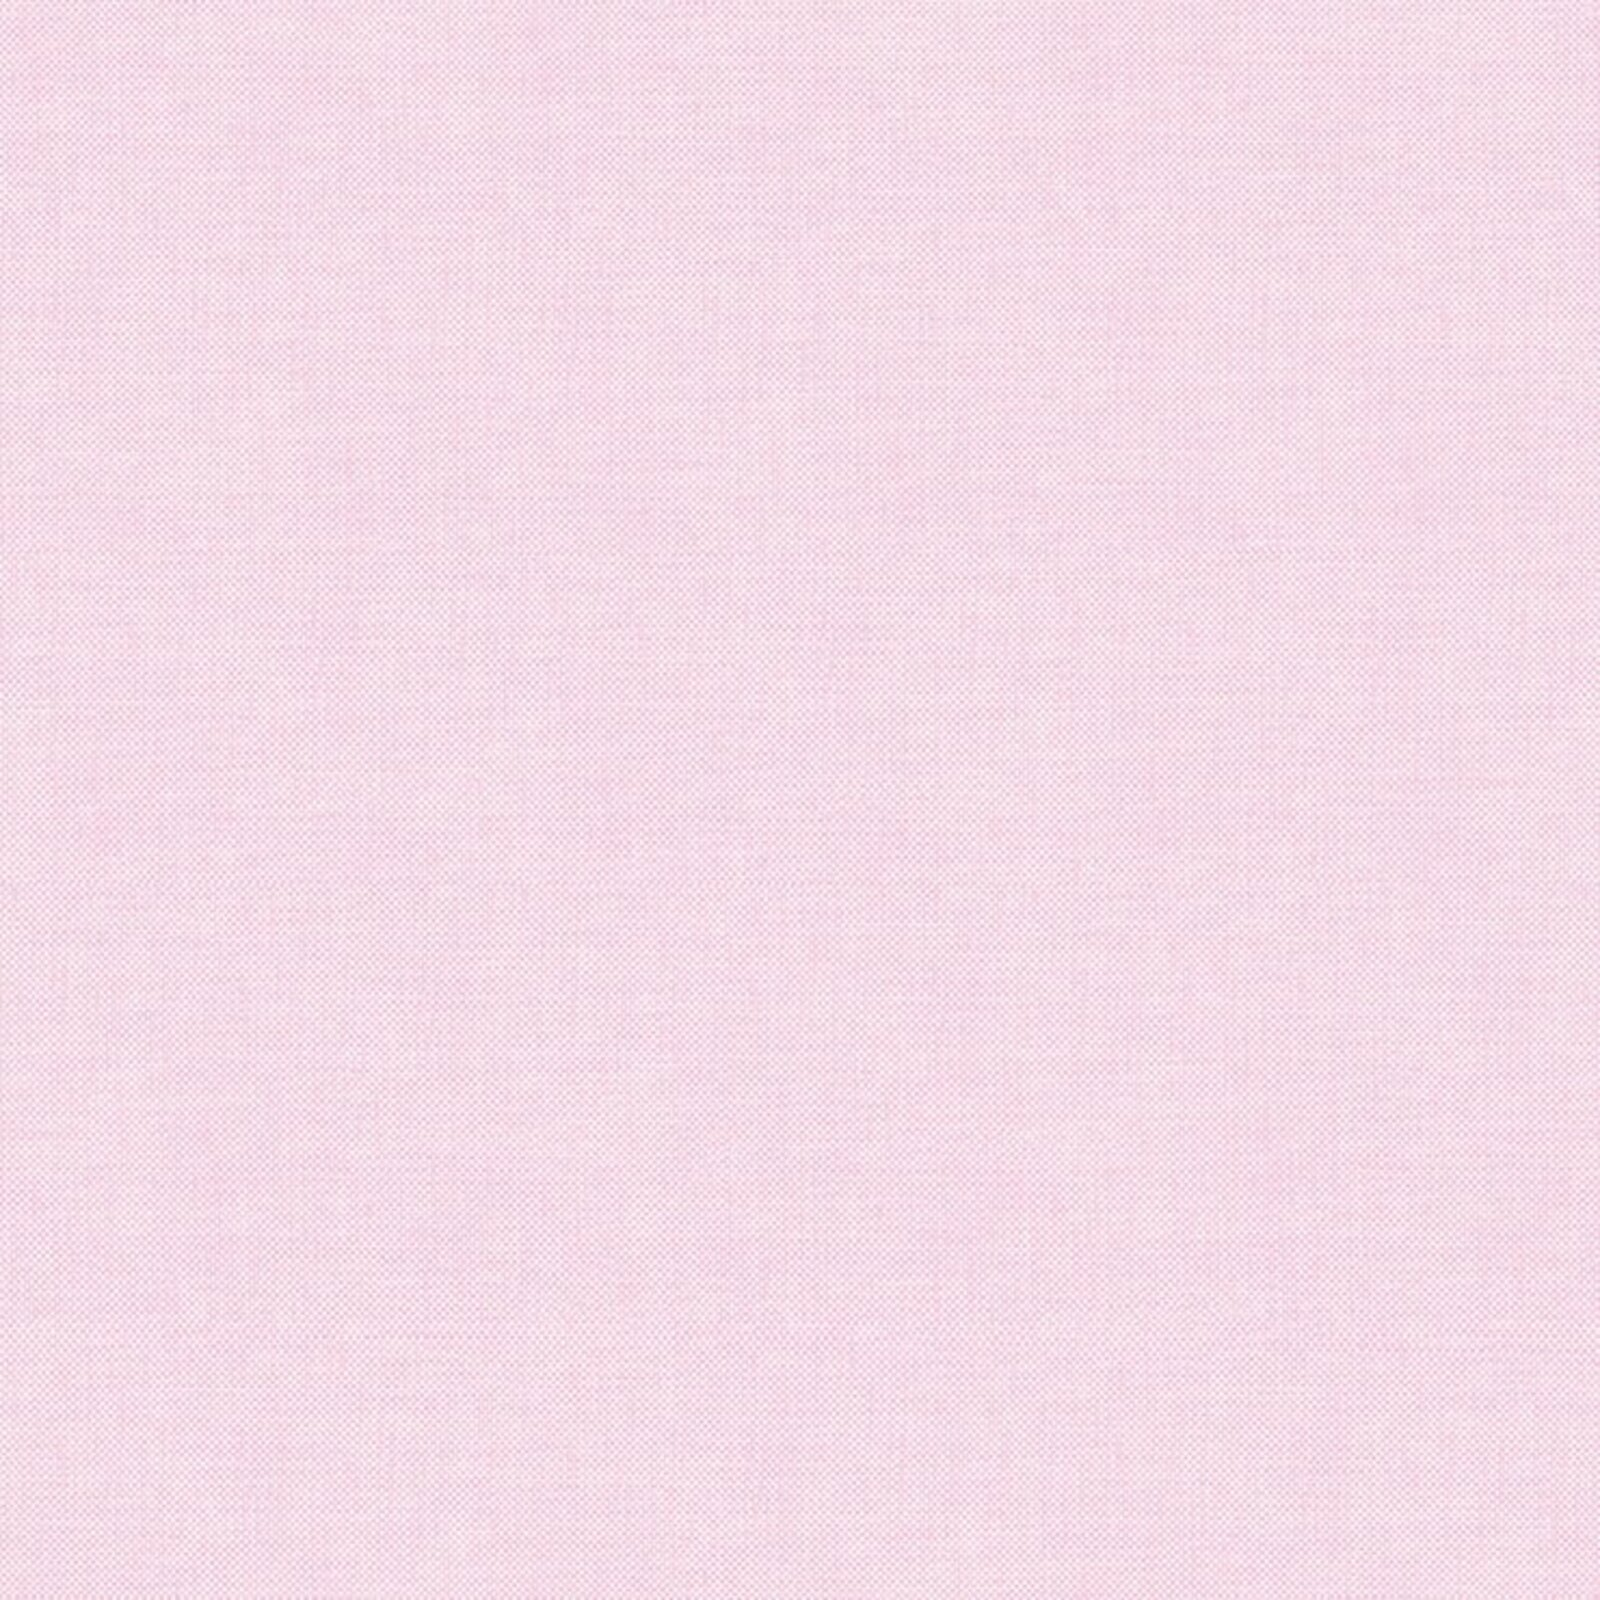 Papel de Parede Lyam Decor Liso Rosa